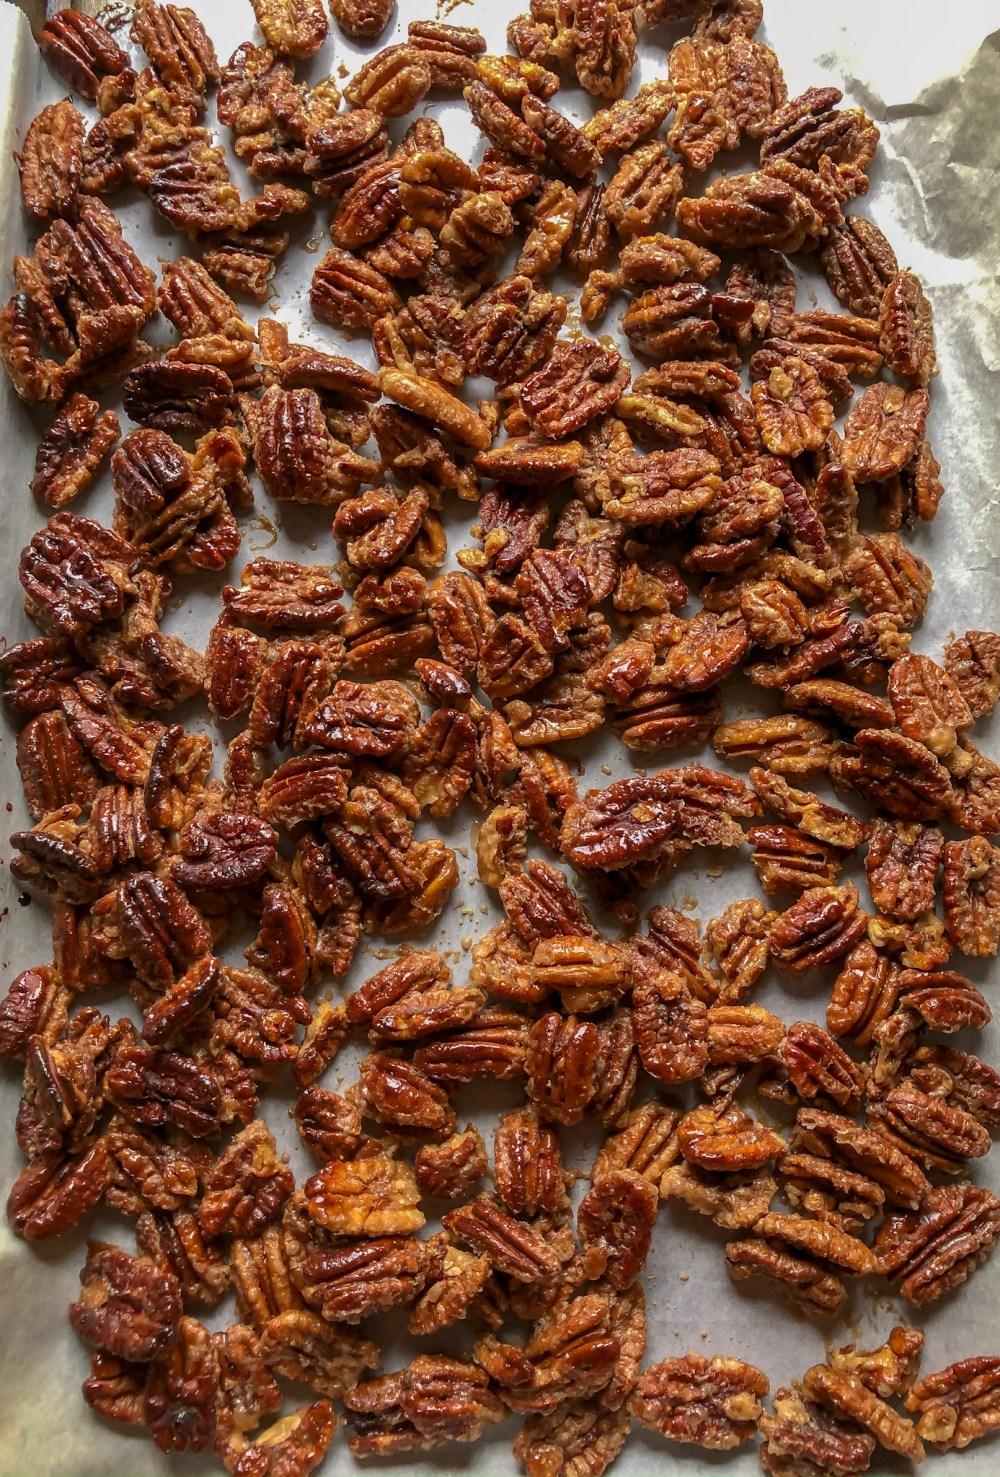 caramelized pecans